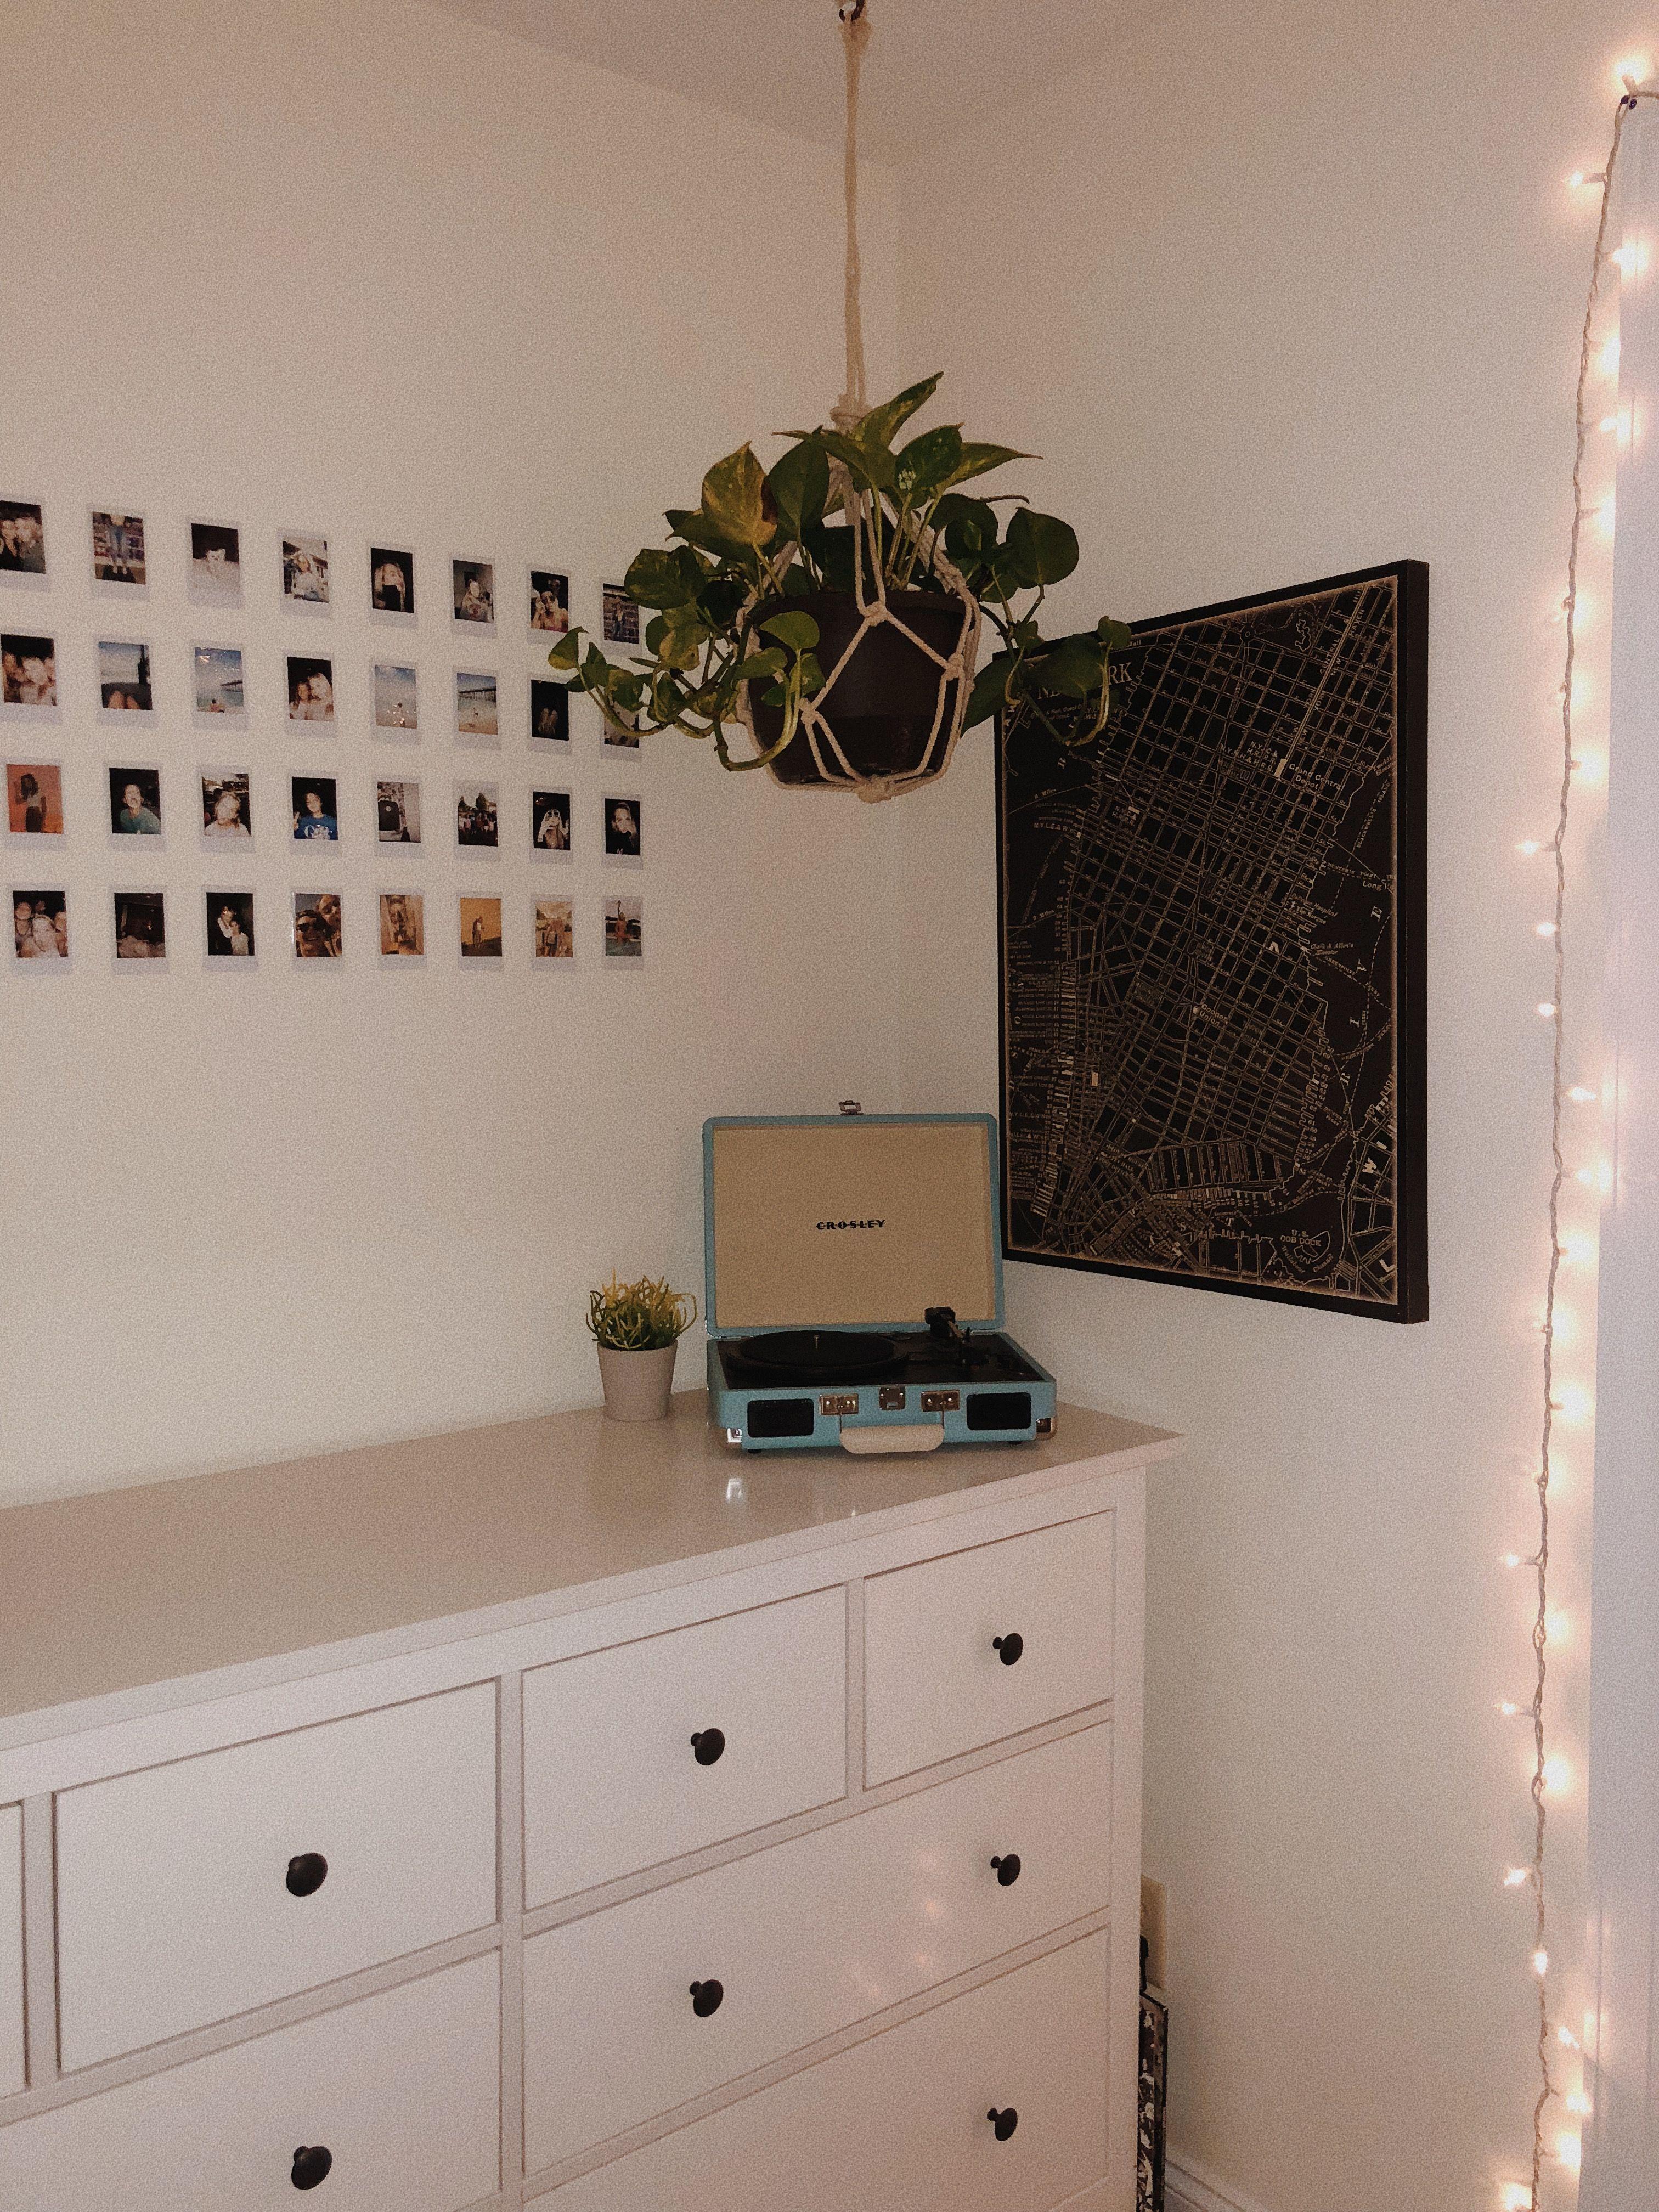 Artsy Bedroom Teen Bedroom White Walls Green Plants Polaroid Wall